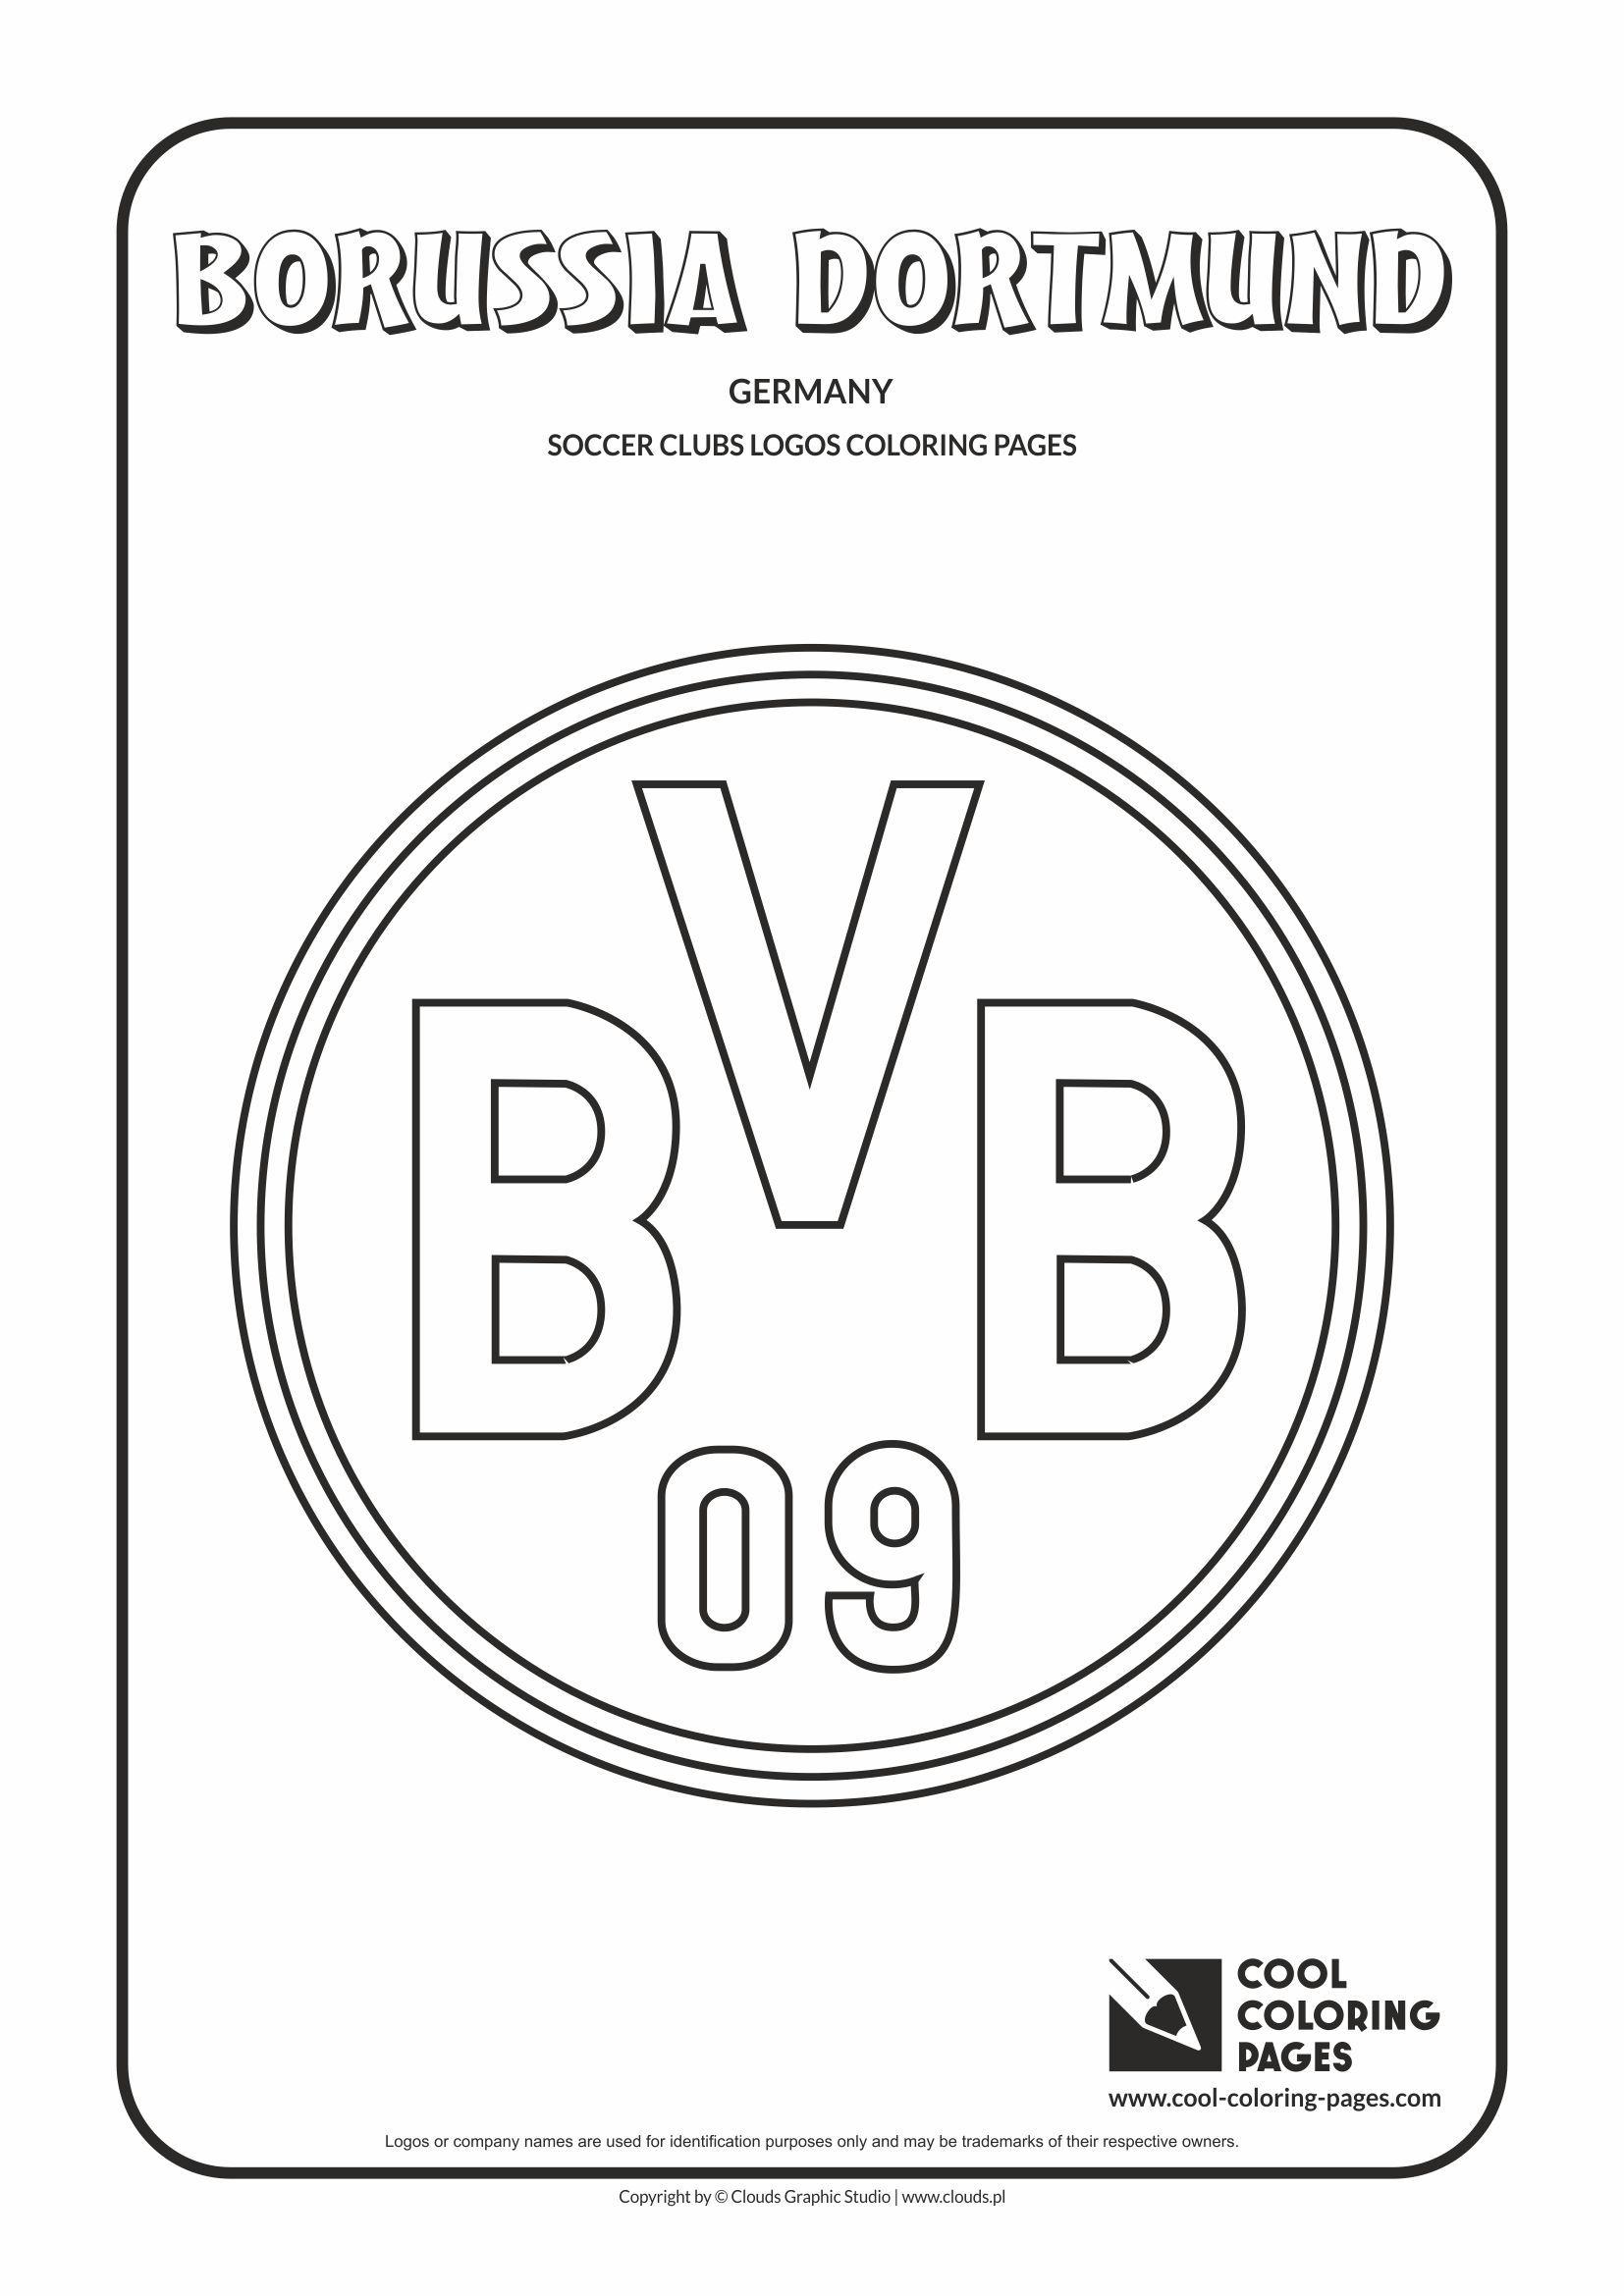 Borussia Dortmund Logo Coloring Page